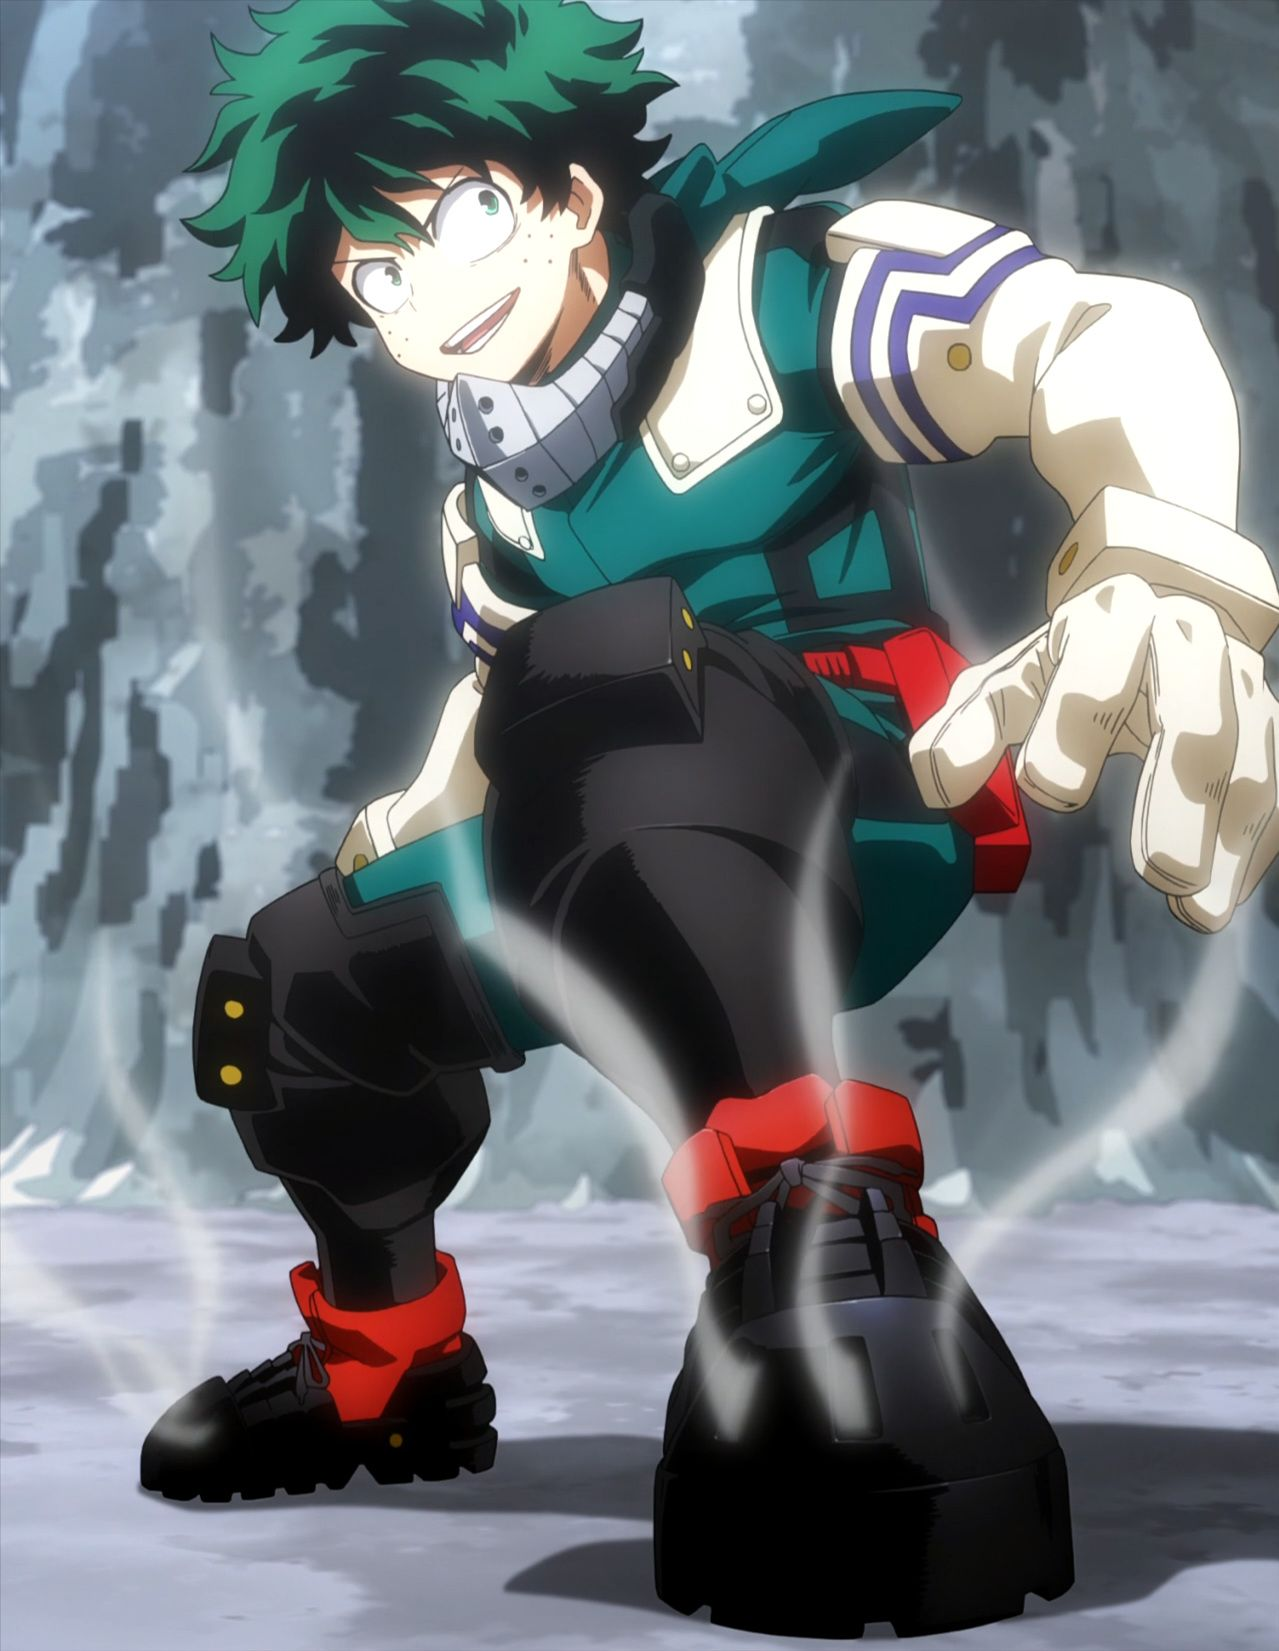 Boku No Hero Academia 3 Tv Media Review Episodio 14 Solucion De Anime Hero Boku No Hero Academia Hero Academia Characters